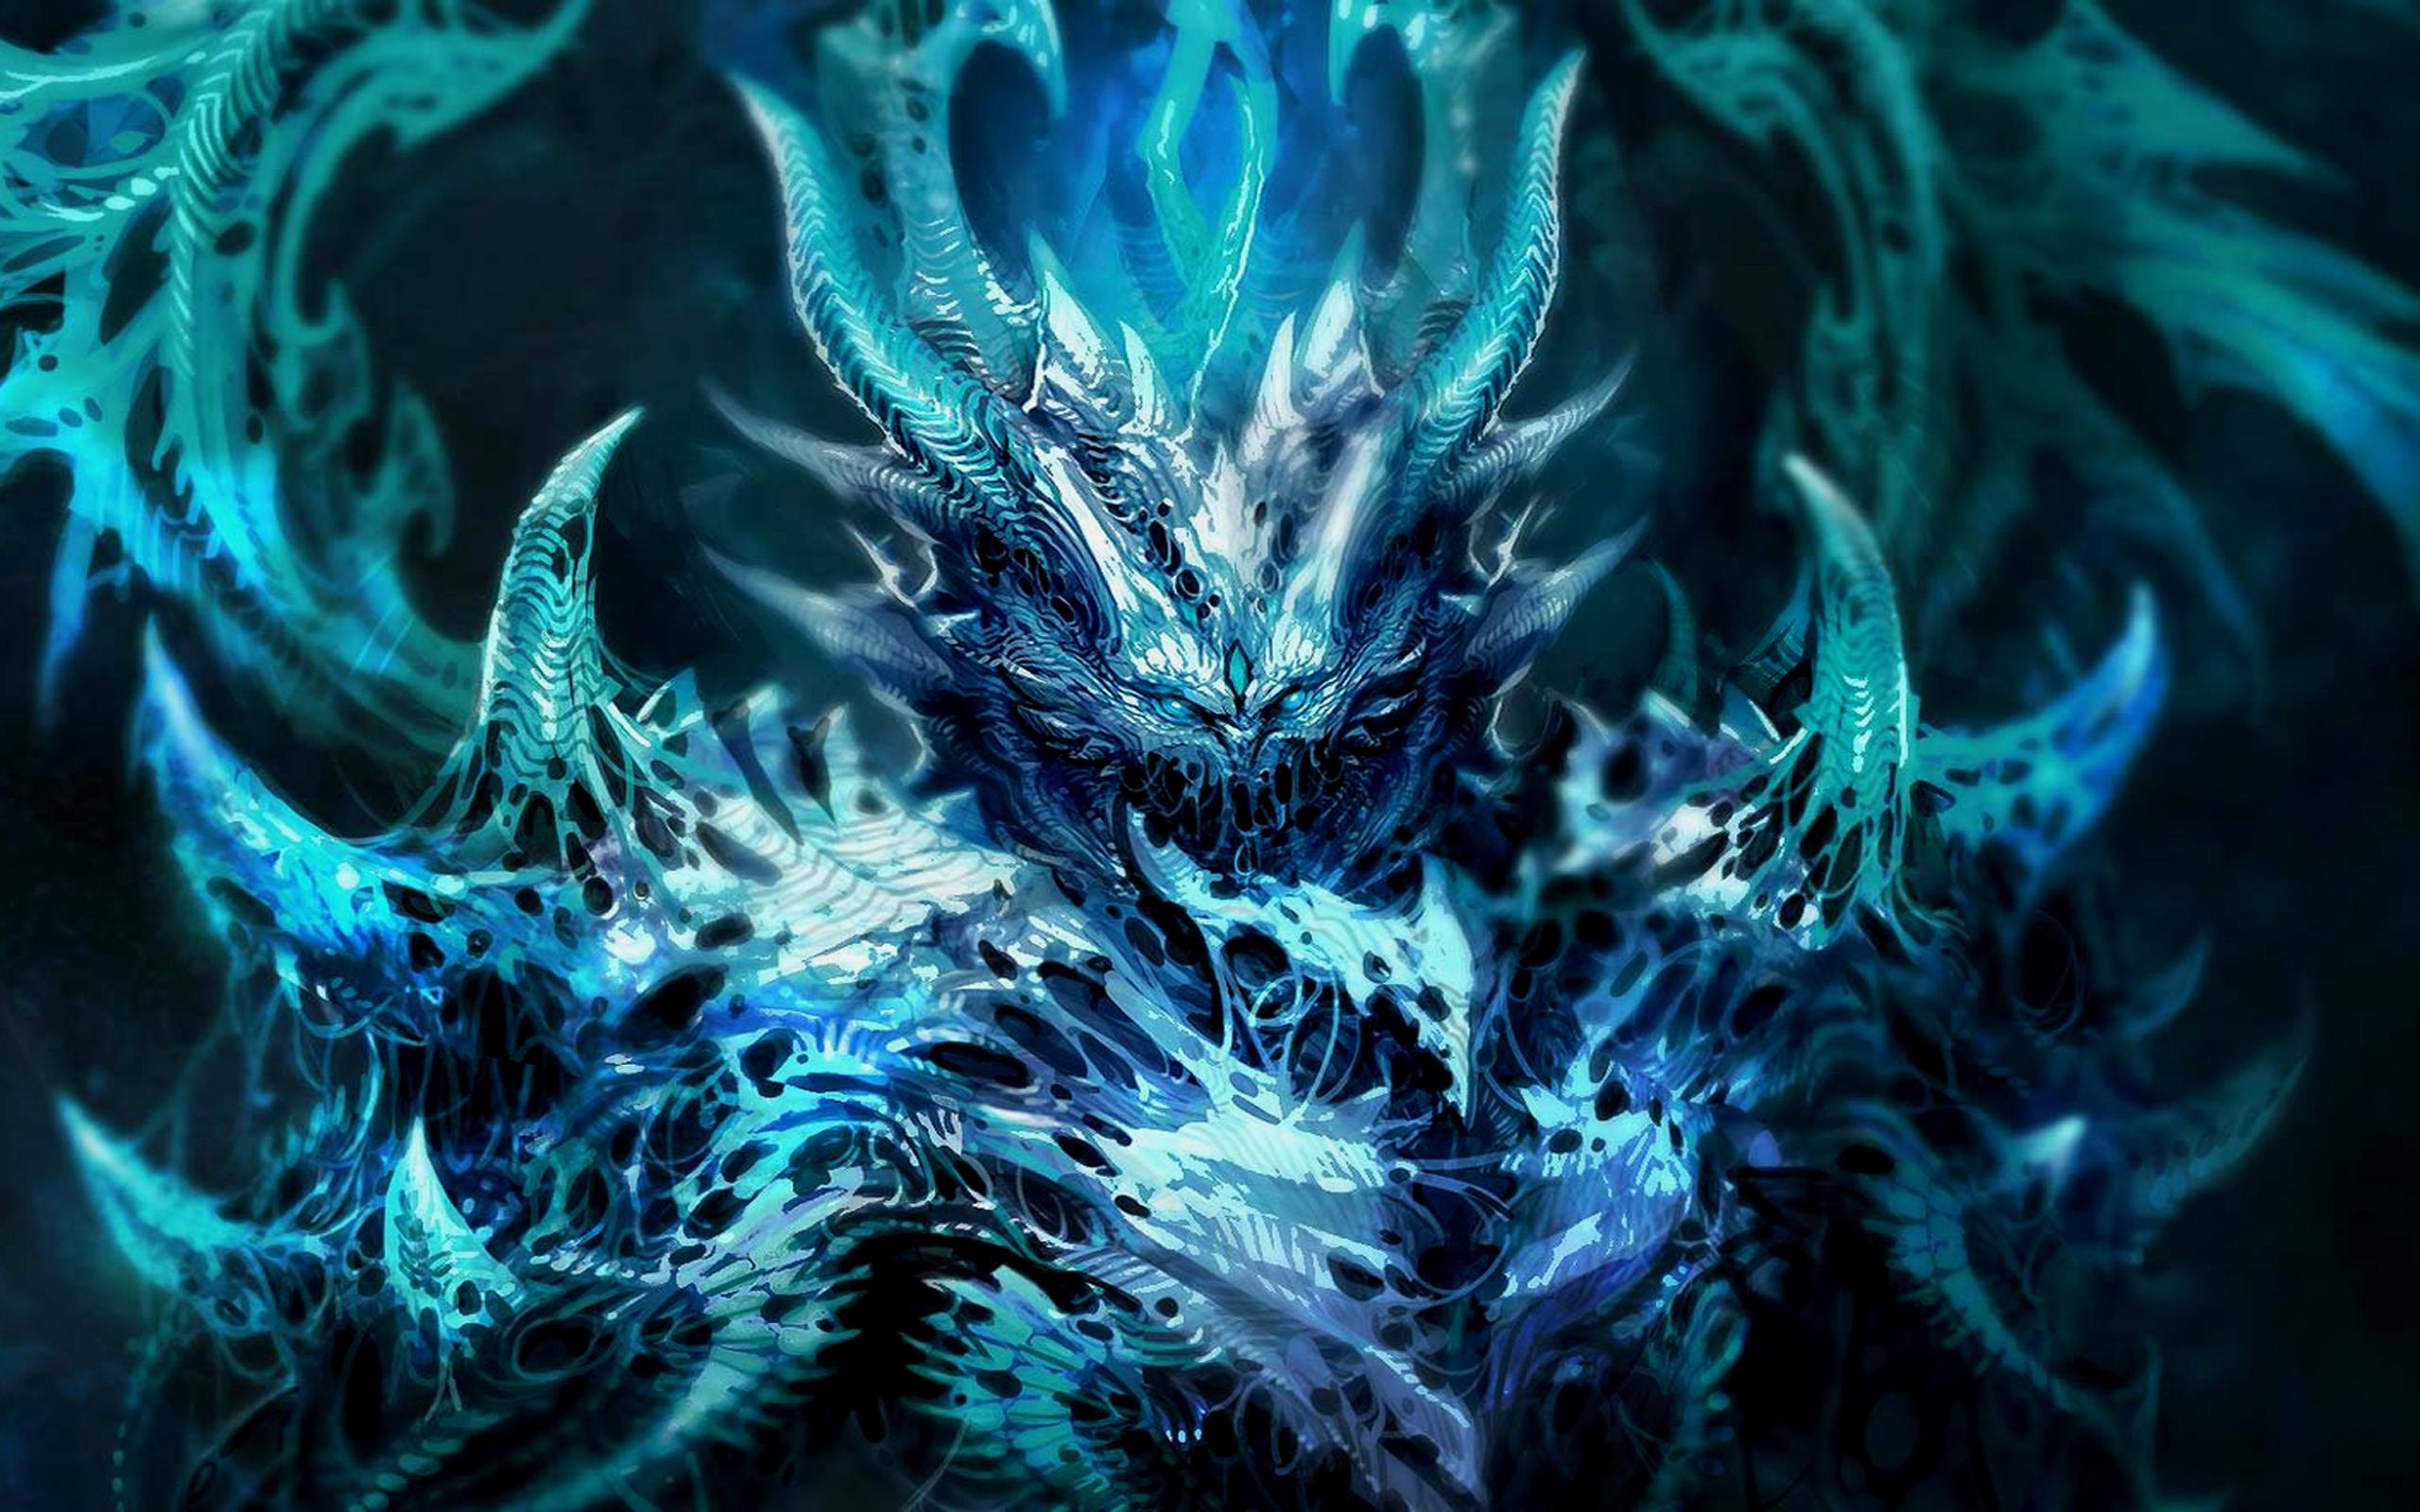 Demon wallpaper   1035790 2560x1600